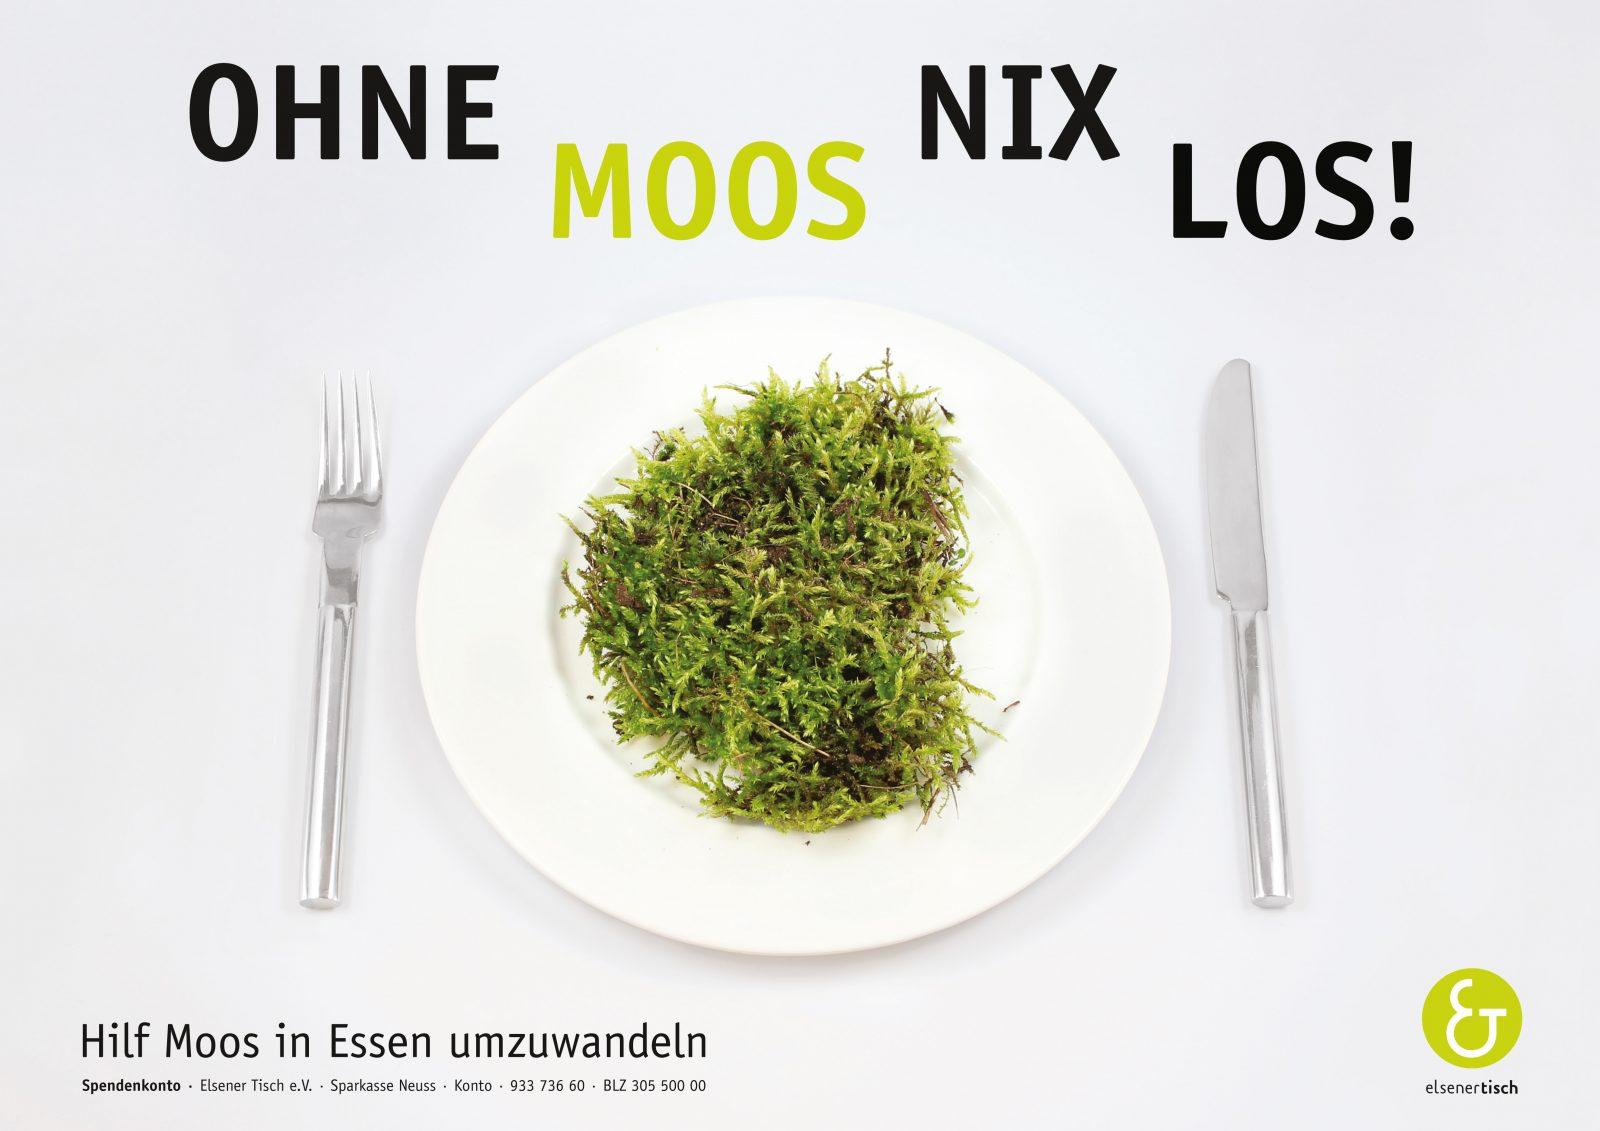 Elvira_Kalinowski_Julia_Wesslén – Poster Campaign